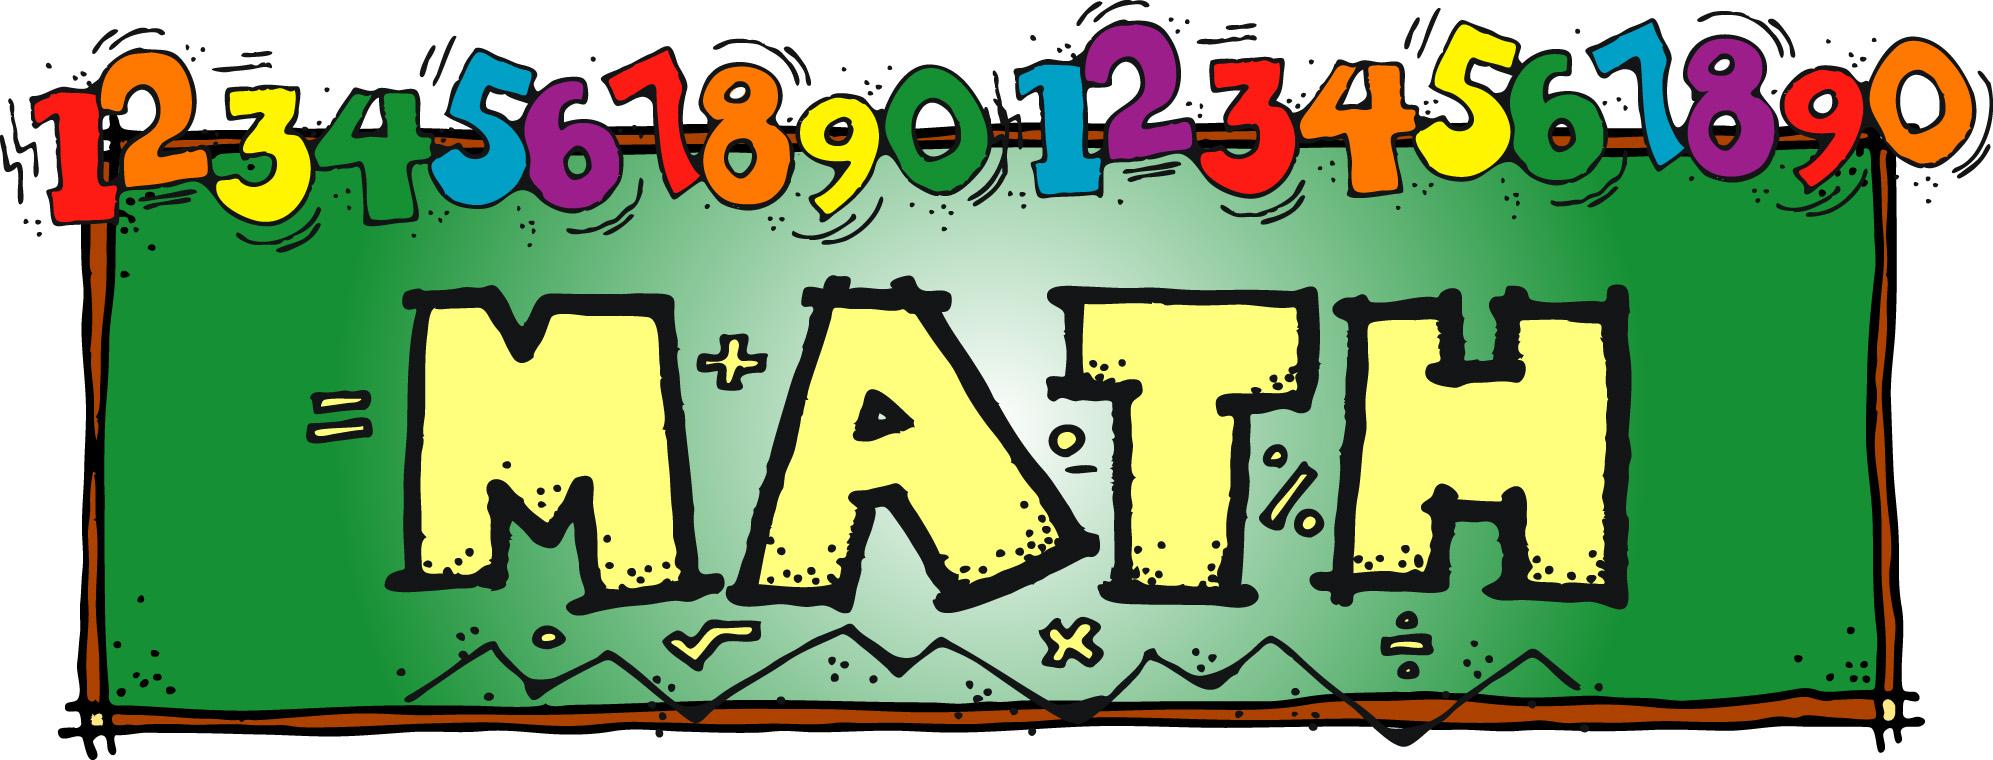 Mathematics Yake Elementary School